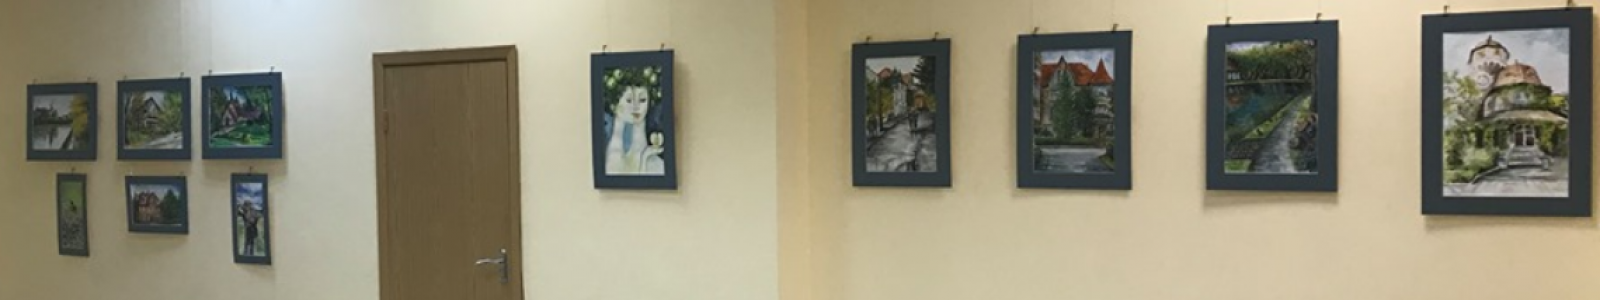 Gallery Painter Tatyana Chuprina